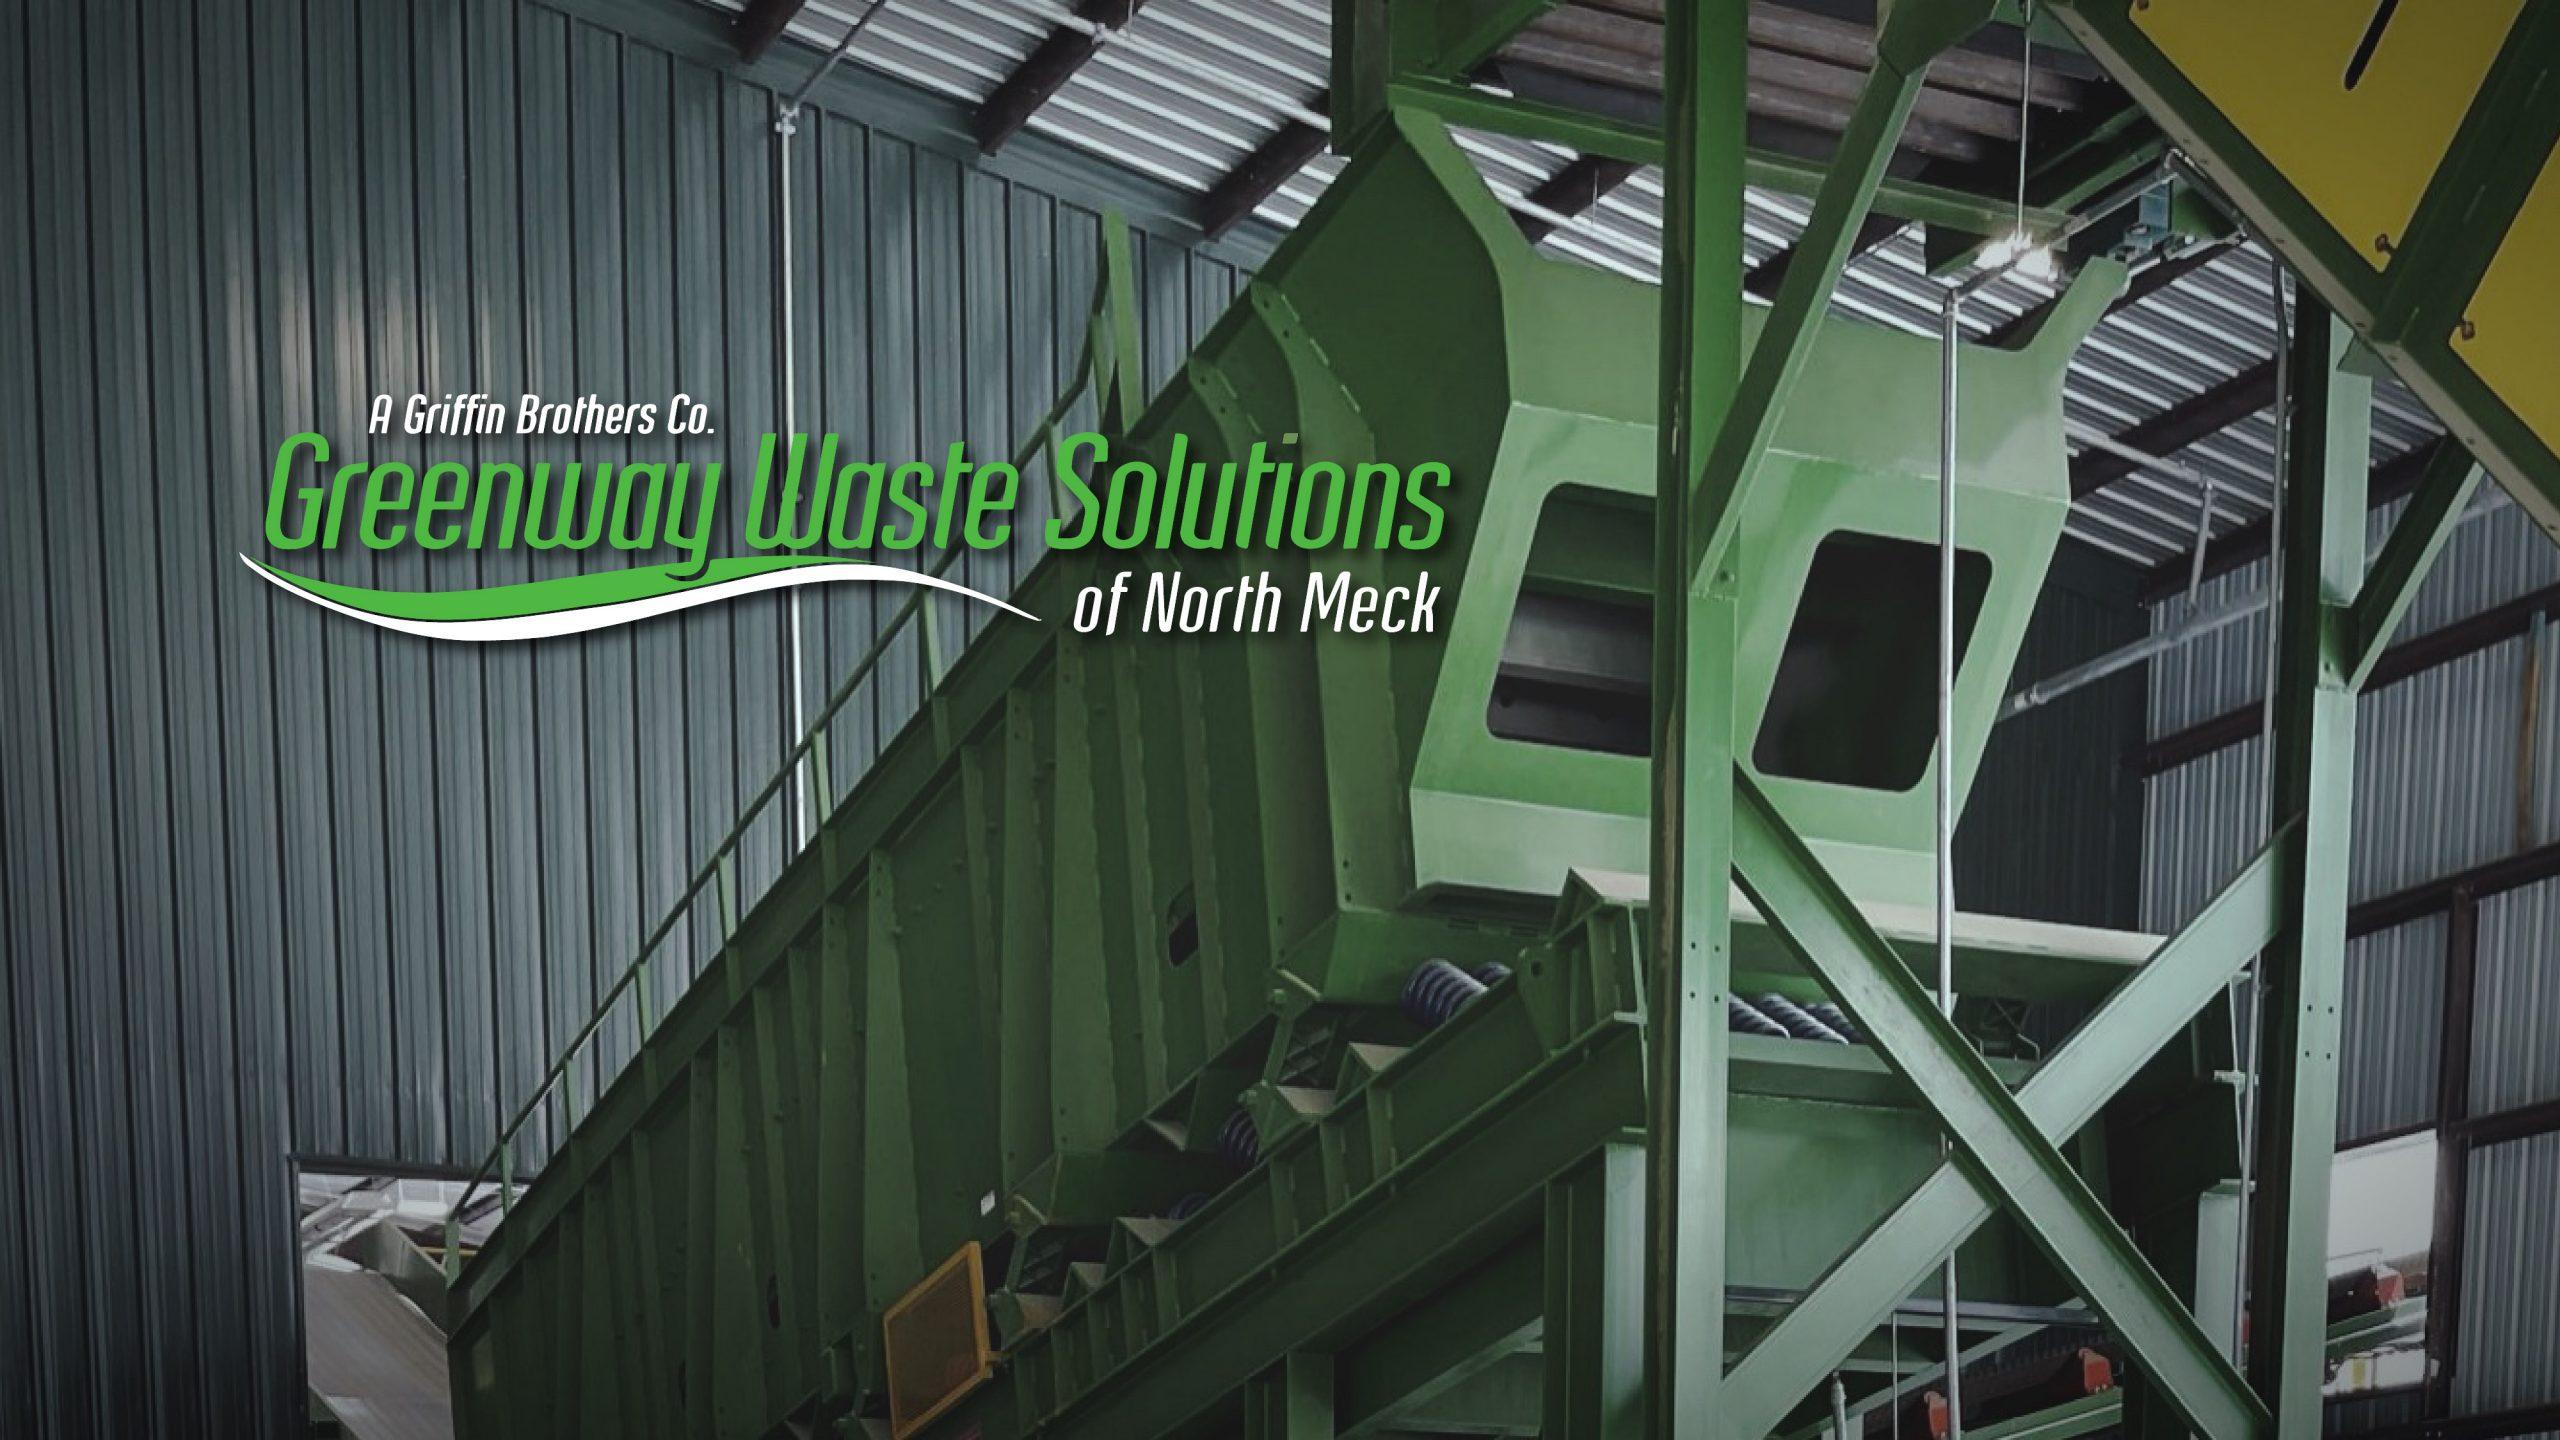 Greenway Waste Solutions Dedicates Construction & Demolition Recycling System at New Facility in Huntersville, North Carolina